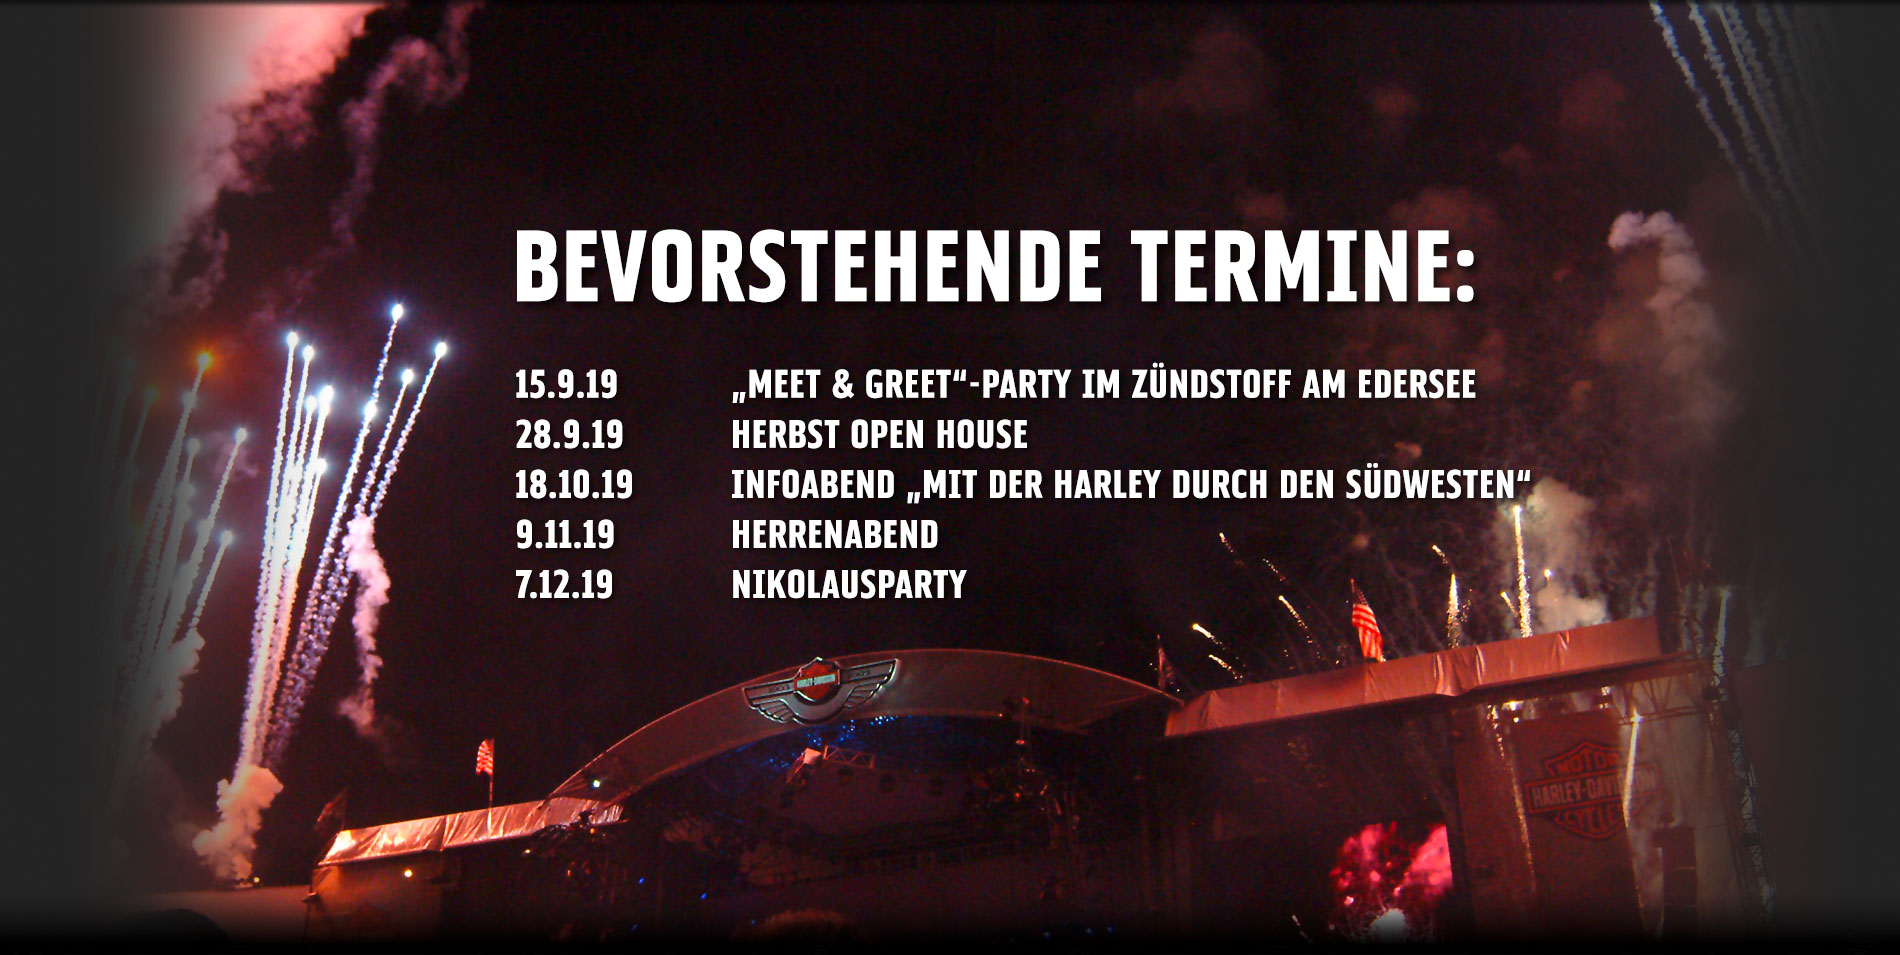 HD_Kassel_Website_Billboard_Events2019_1900x955